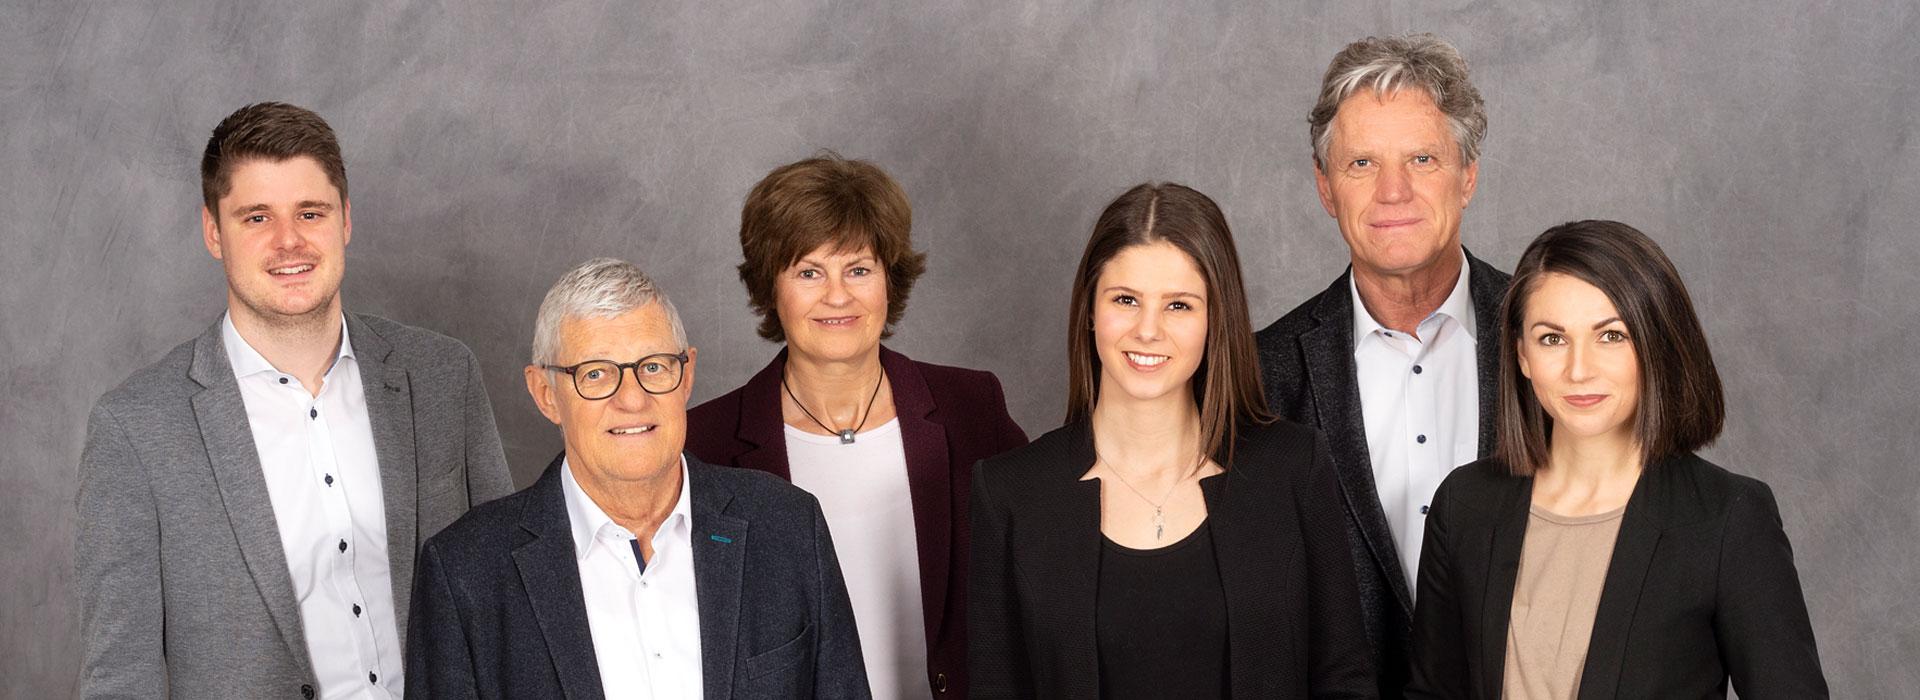 Chiemgau Immobilien Team